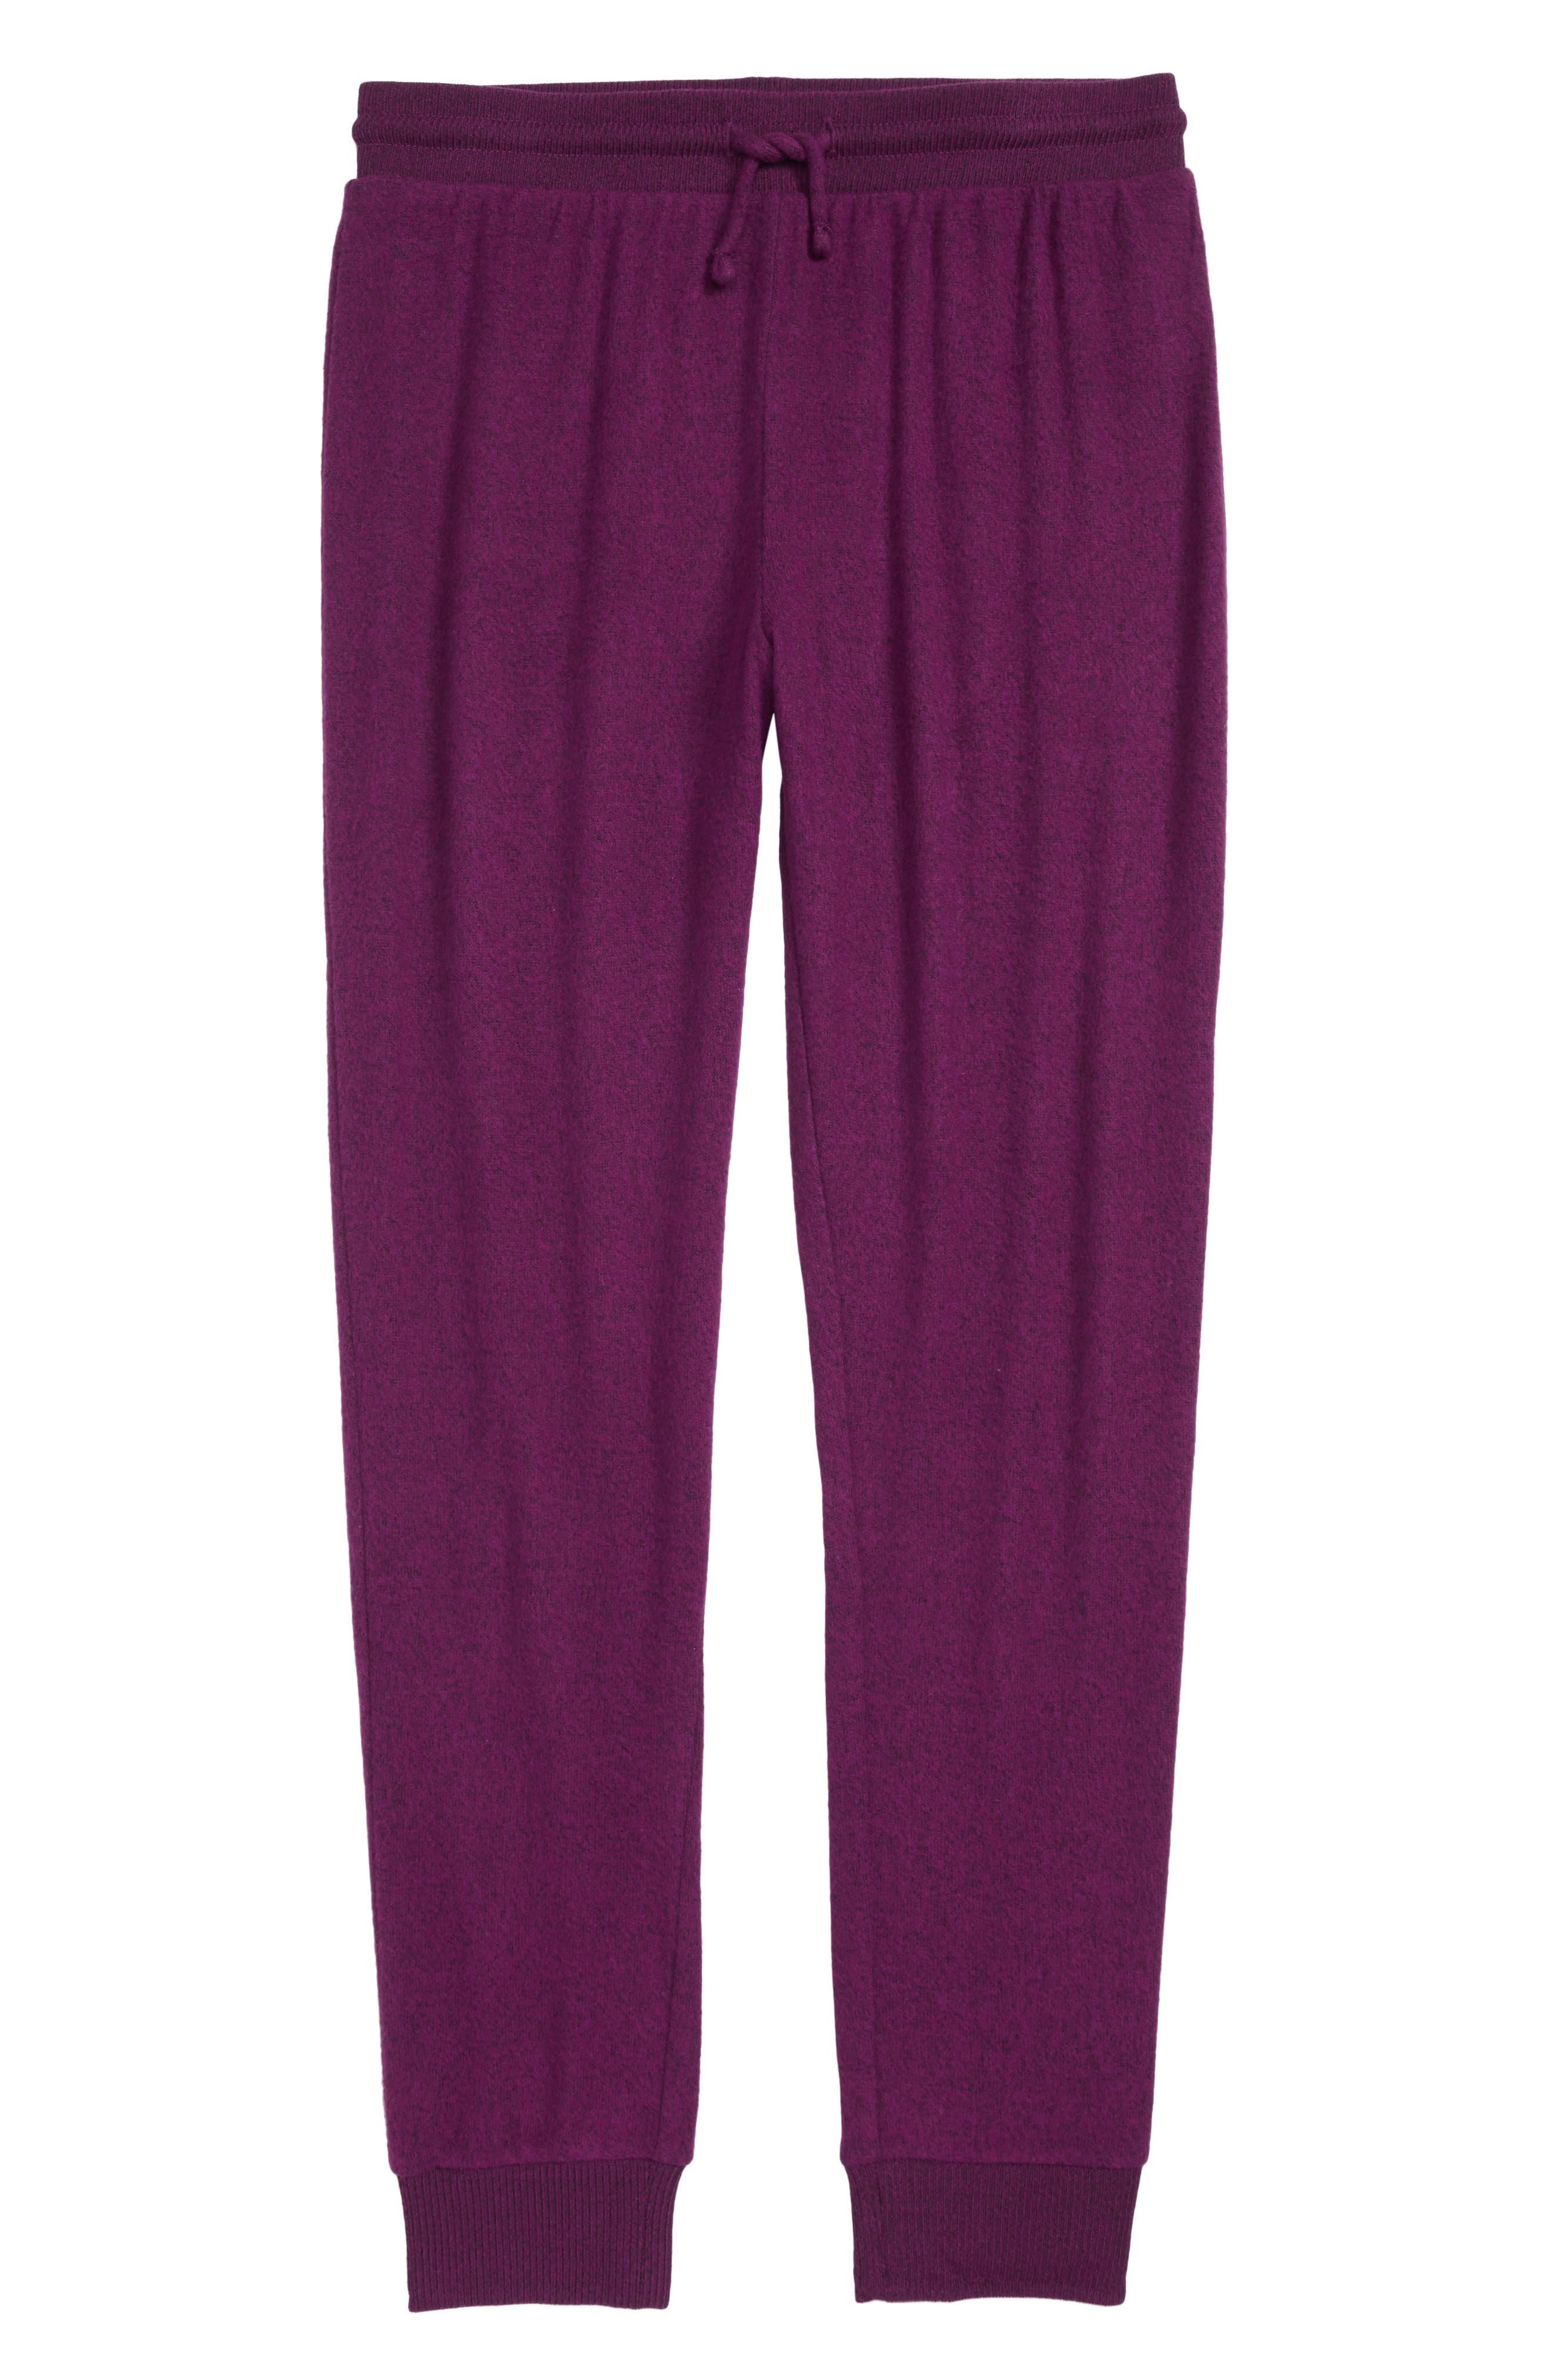 Jogger Pants,                         Main,                         color, PURPLE DARK HEATHER